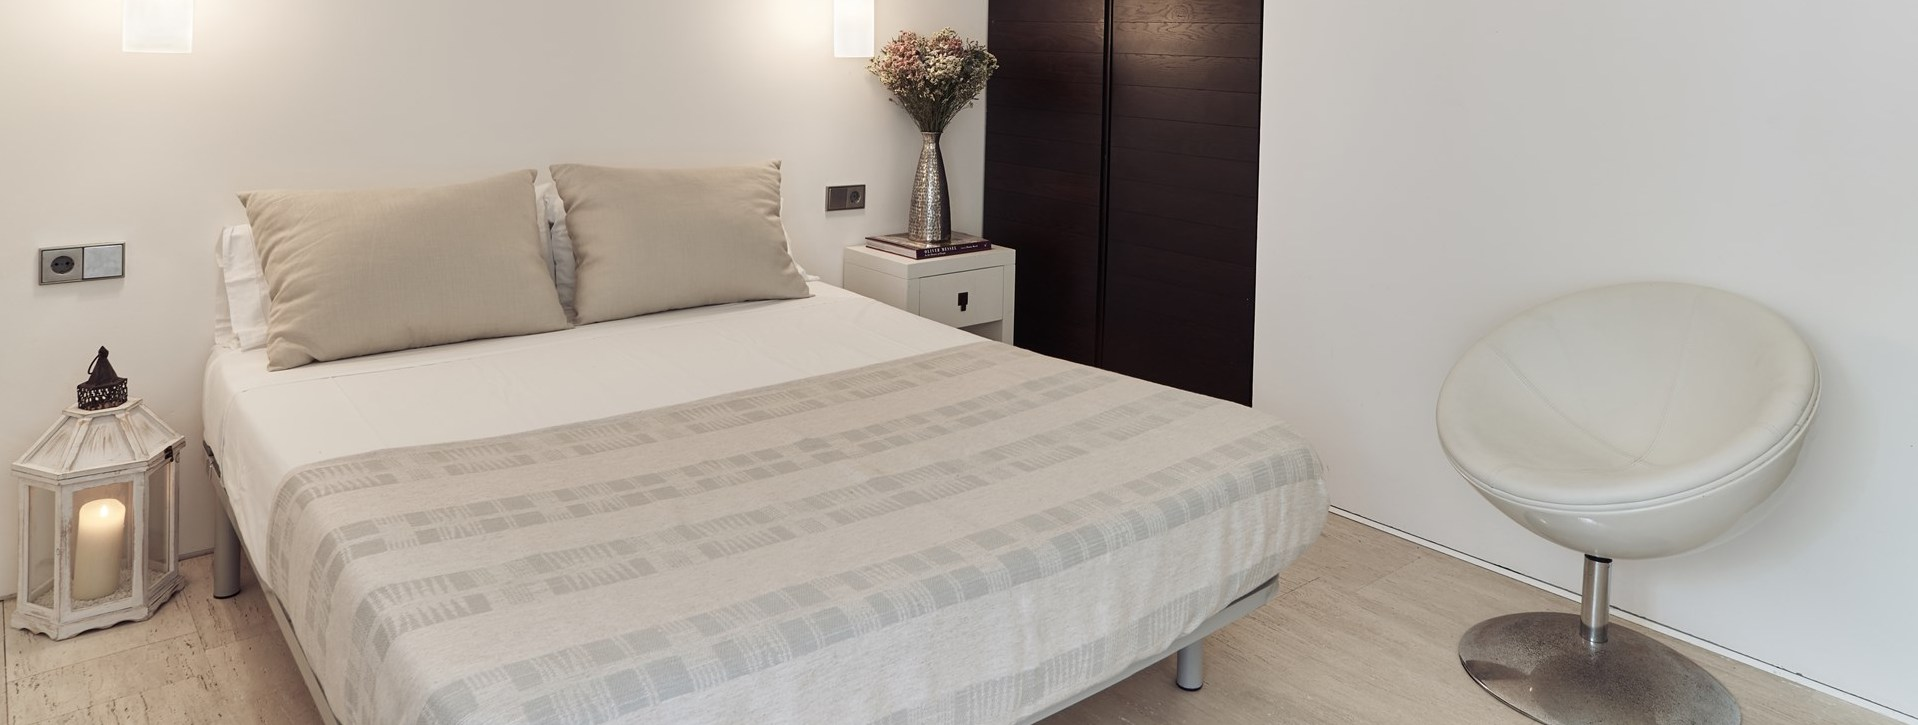 villa-can-castello-double-bedroom3